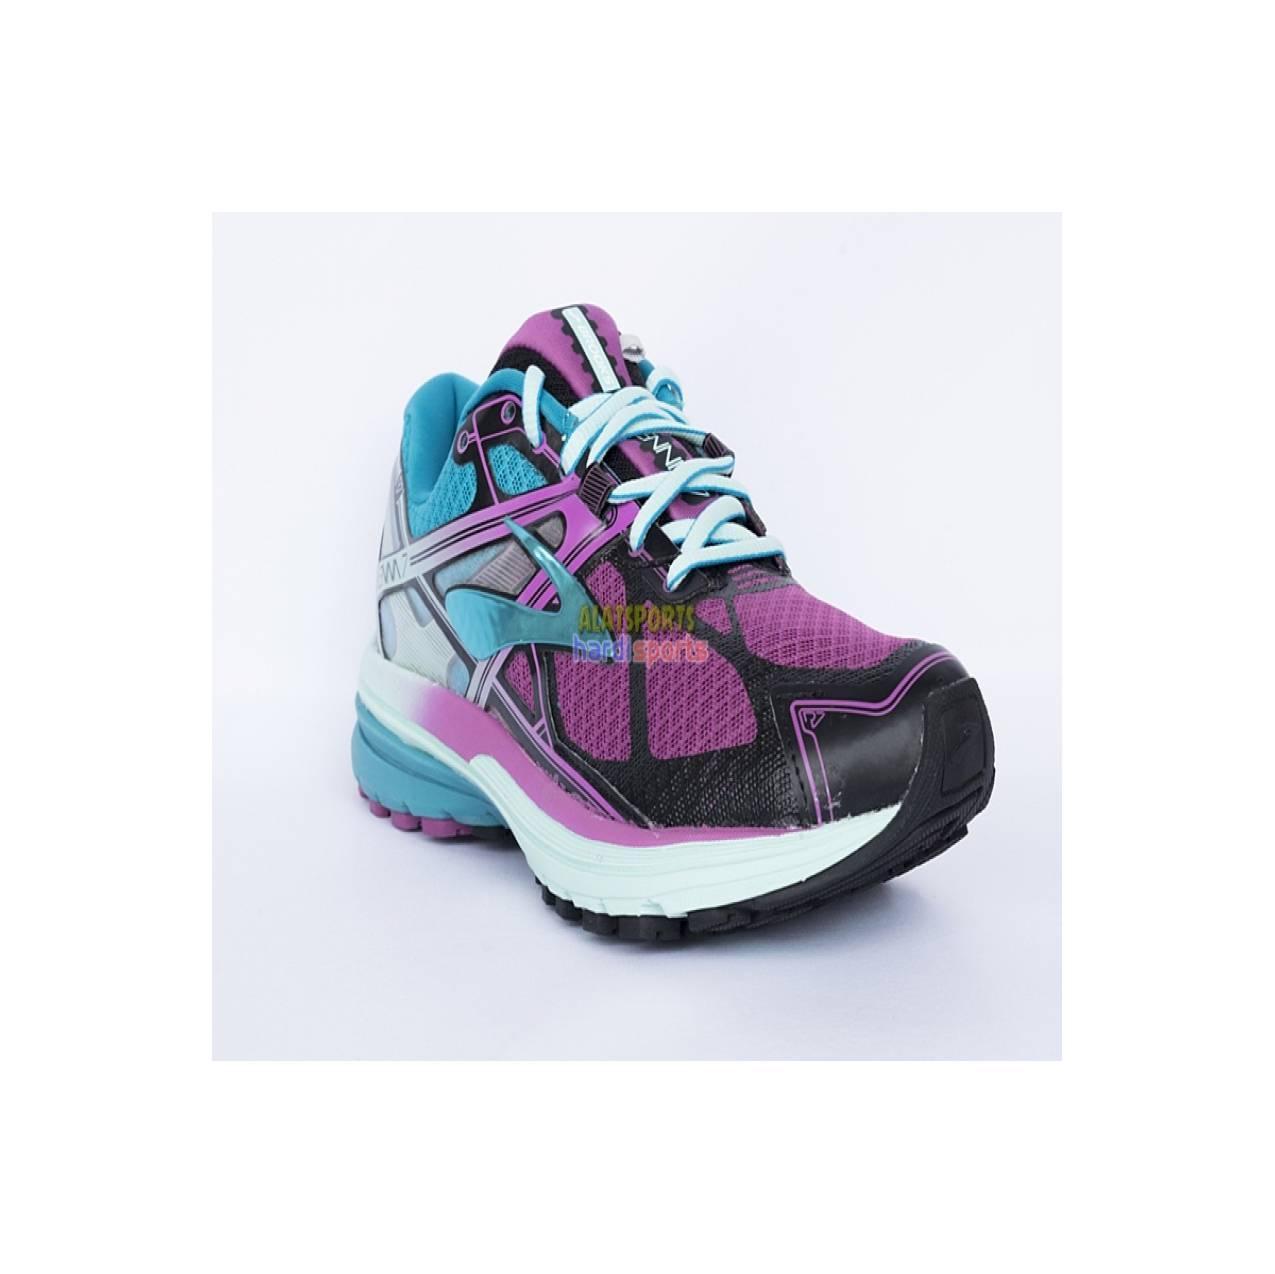 Sepatu Running Brooks Ravenna 7 120208-1B528 Deeporchid Original